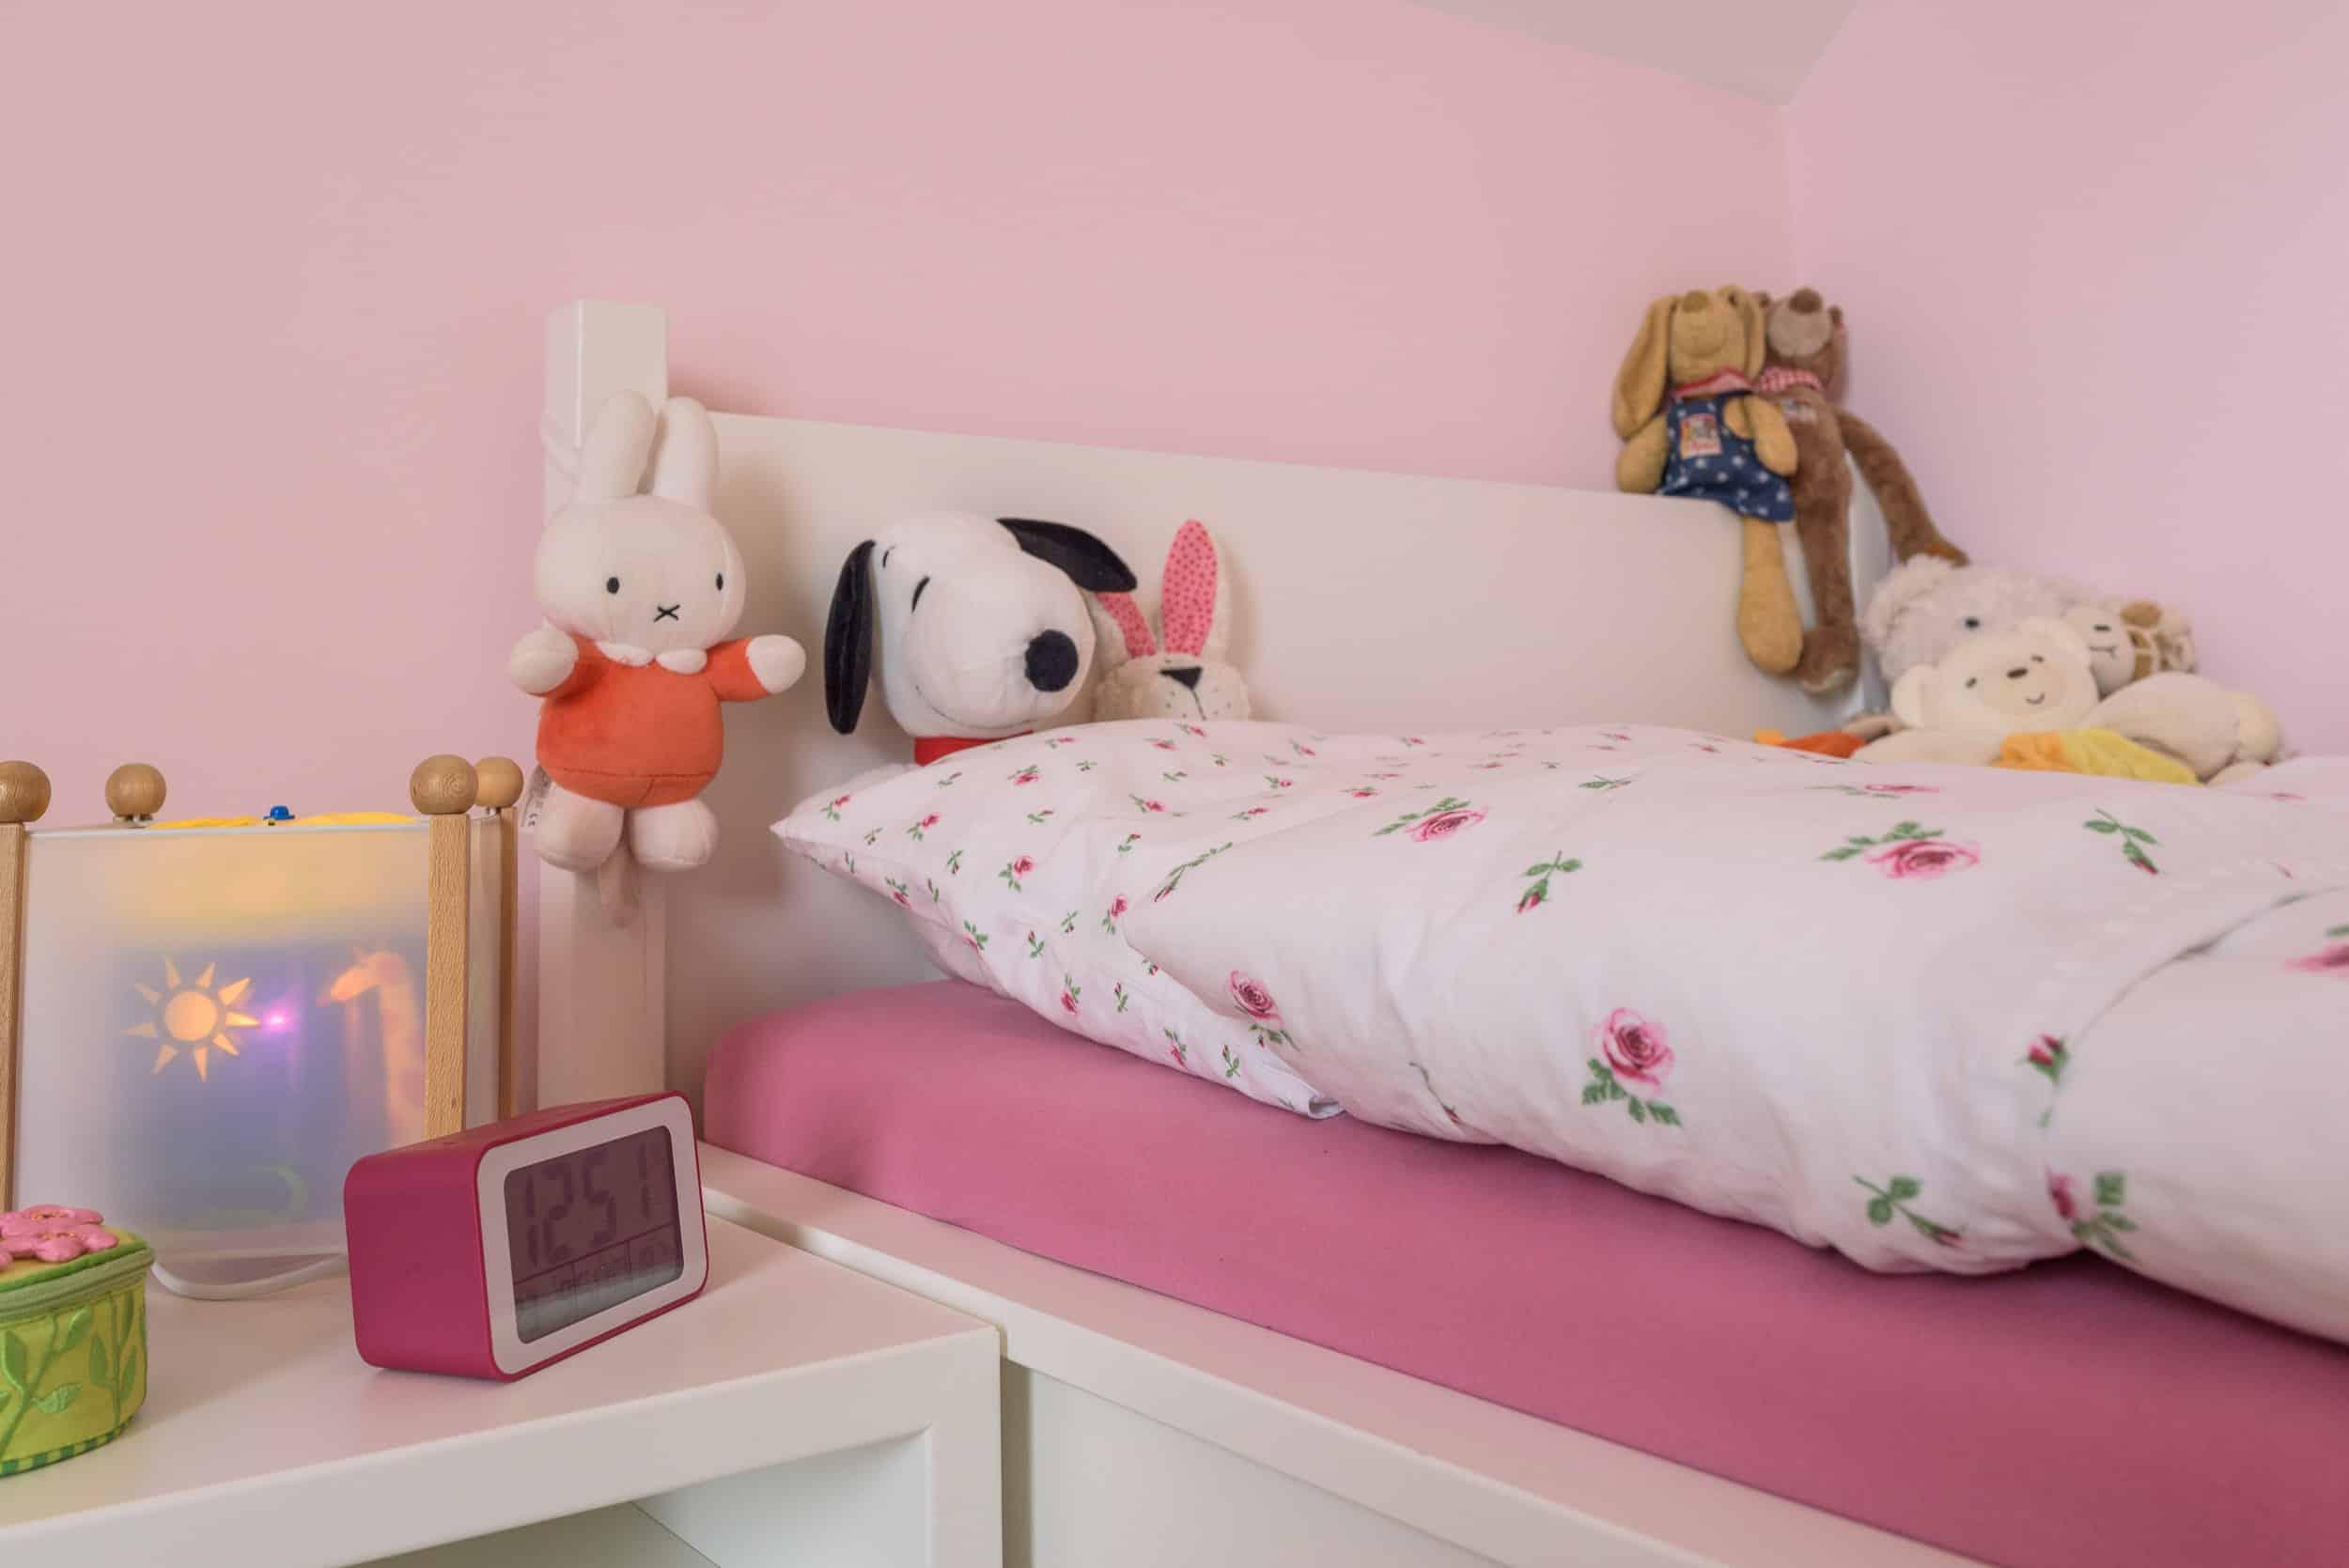 Kinder Himmelbett als Maßanfertigung unter einer DachschrägeKinder Himmelbett als Maßanfertigung unter einer Dachschräge